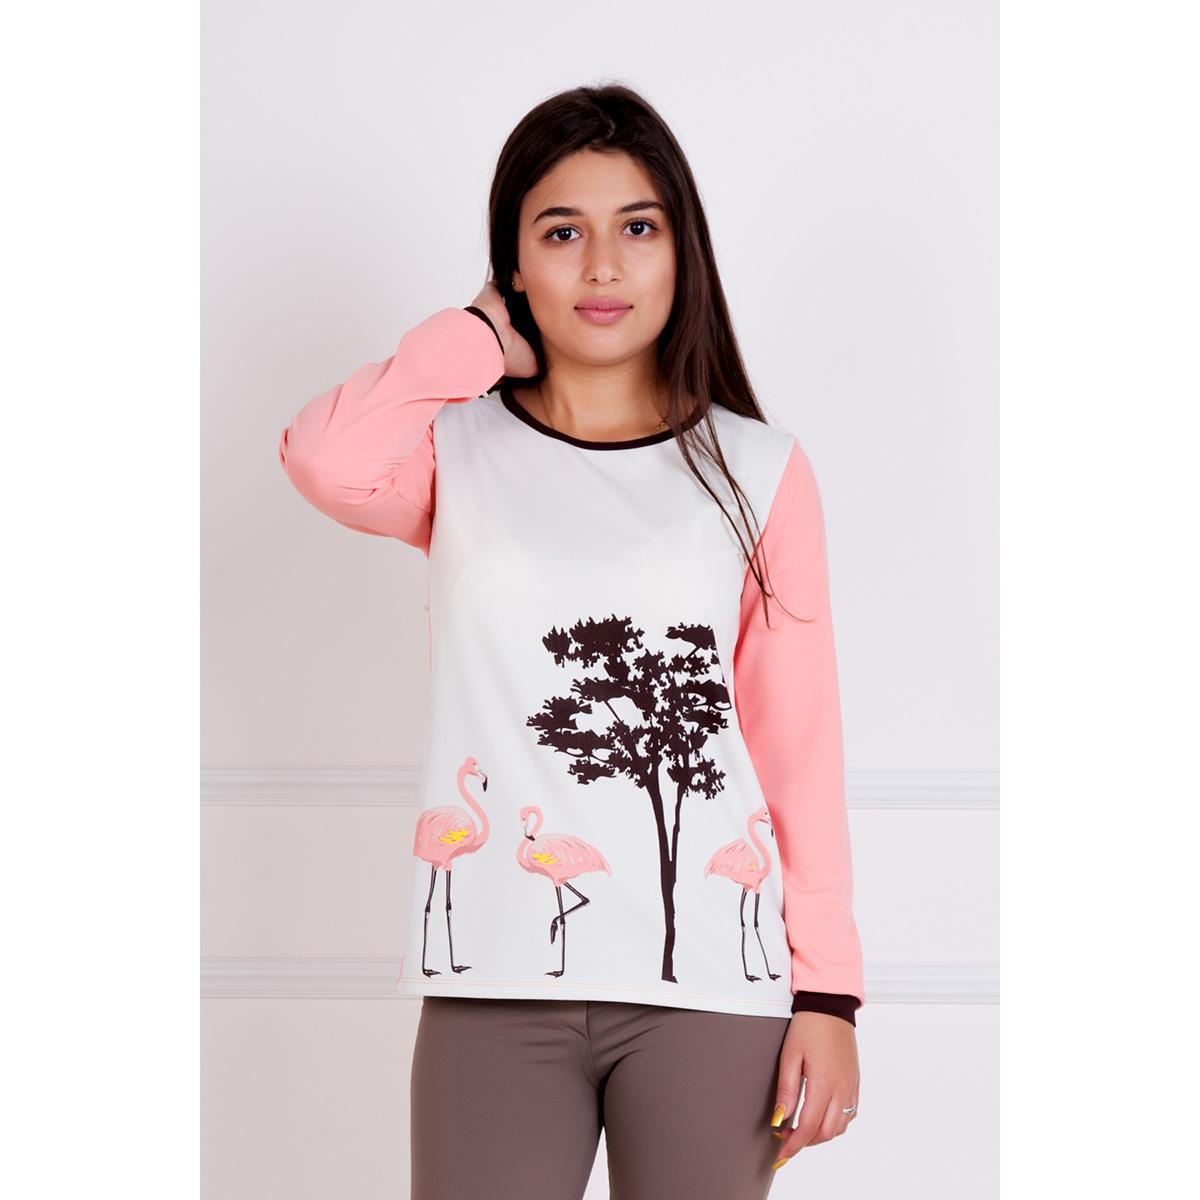 Женская блуза Фламинго, размер 44Блузки, майки, кофты<br>Обхват груди:88 см<br>Обхват талии:68 см<br>Обхват бедер:96 см<br>Длина по спинке:66 см<br>Рост:167 см<br><br>Тип: Жен. блуза<br>Размер: 44<br>Материал: Креп